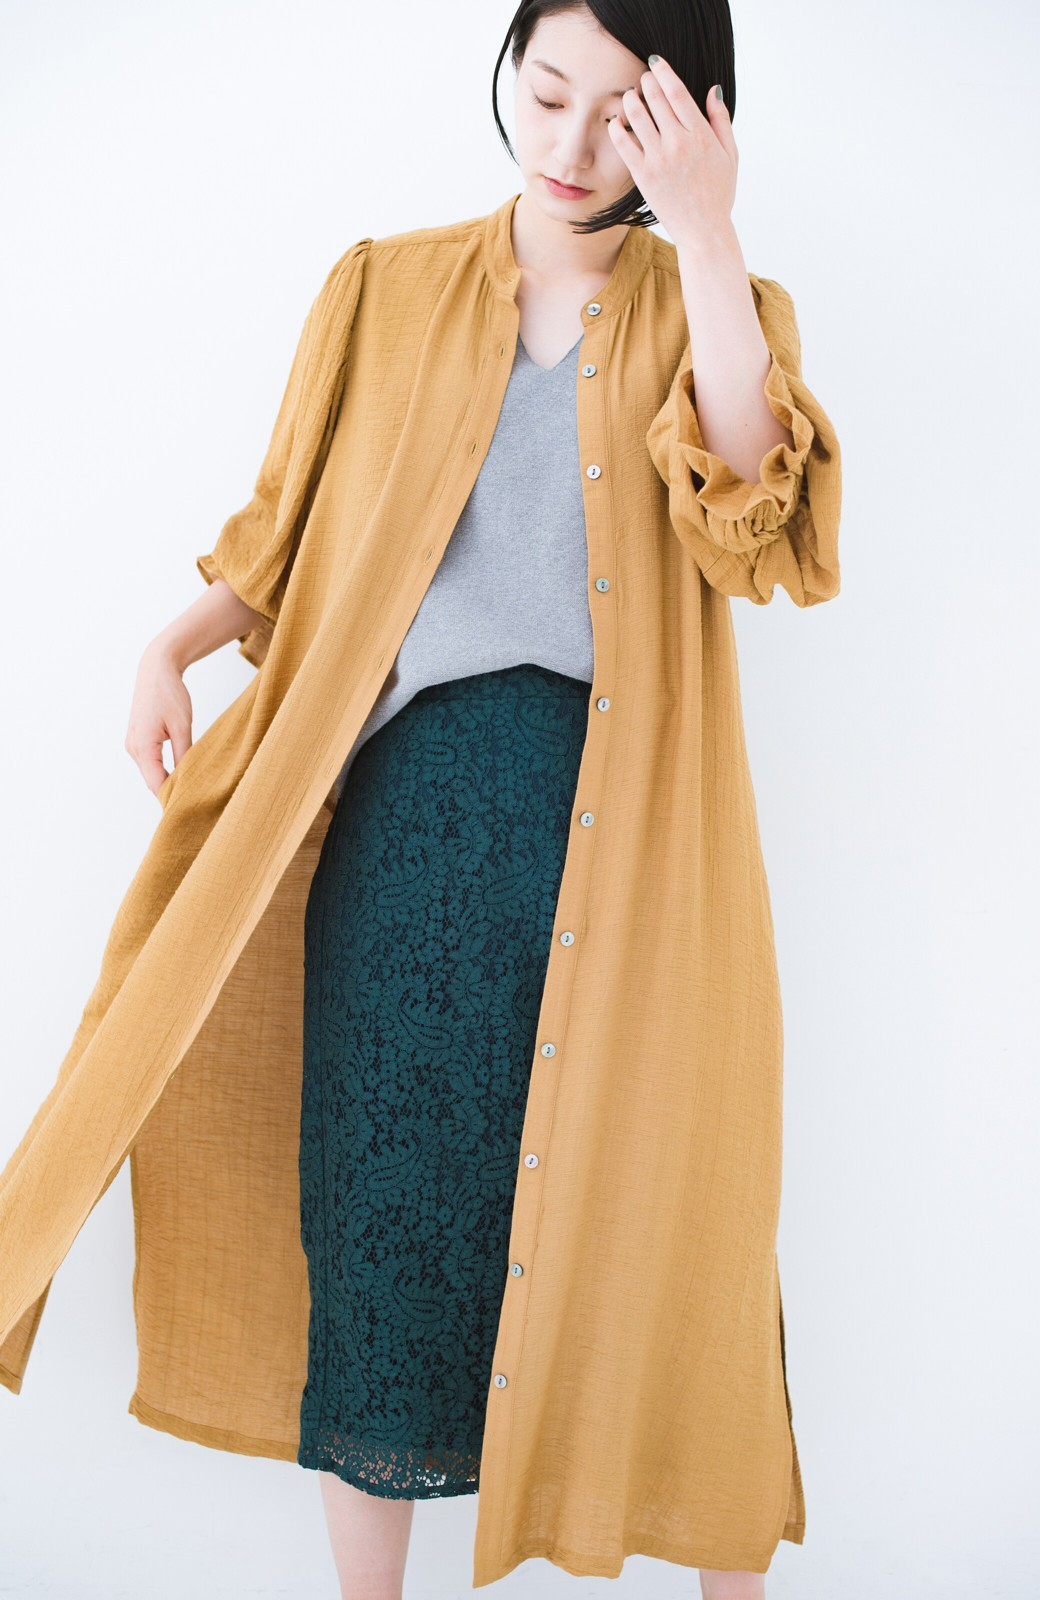 haco! 太ってもばれず 羽織っても便利なウエストリボンワンピース <マスタード>の商品写真5